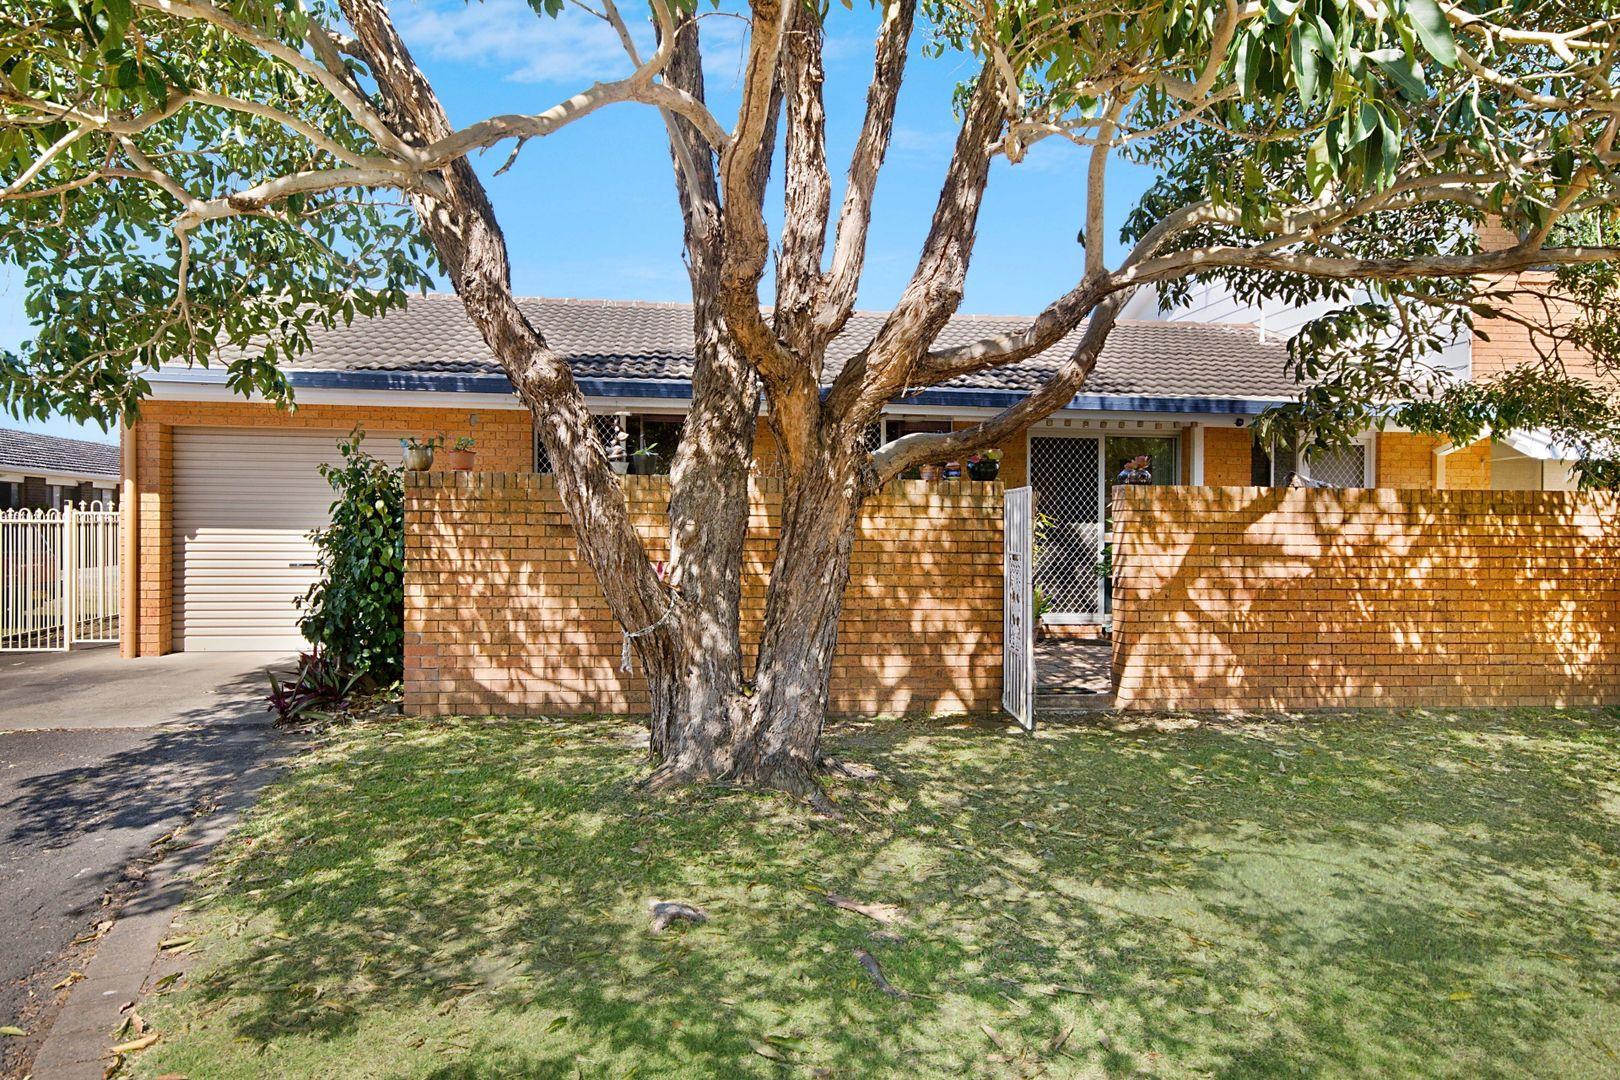 17/114 Cherry Street, Ballina NSW 2478, Image 0